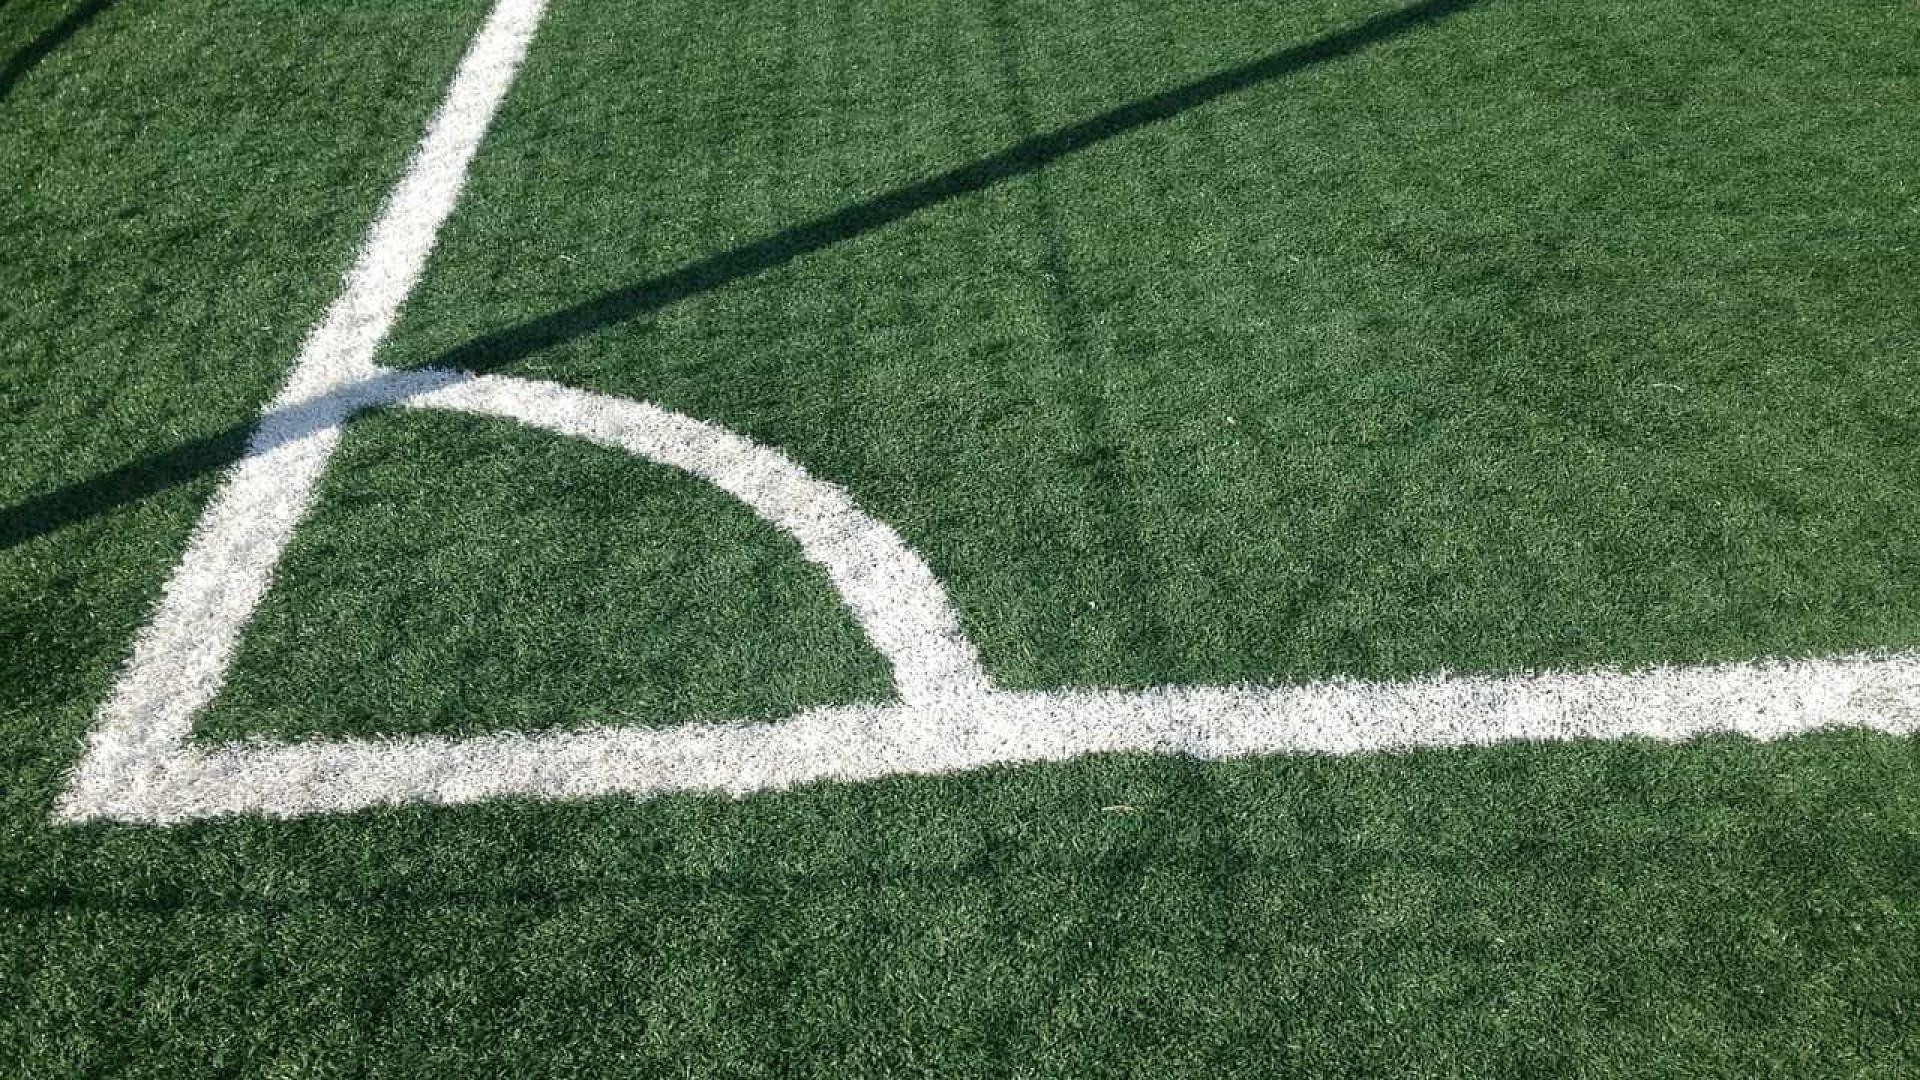 Adversário da Chapecoense pede que título seja atribuído aos brasileiros